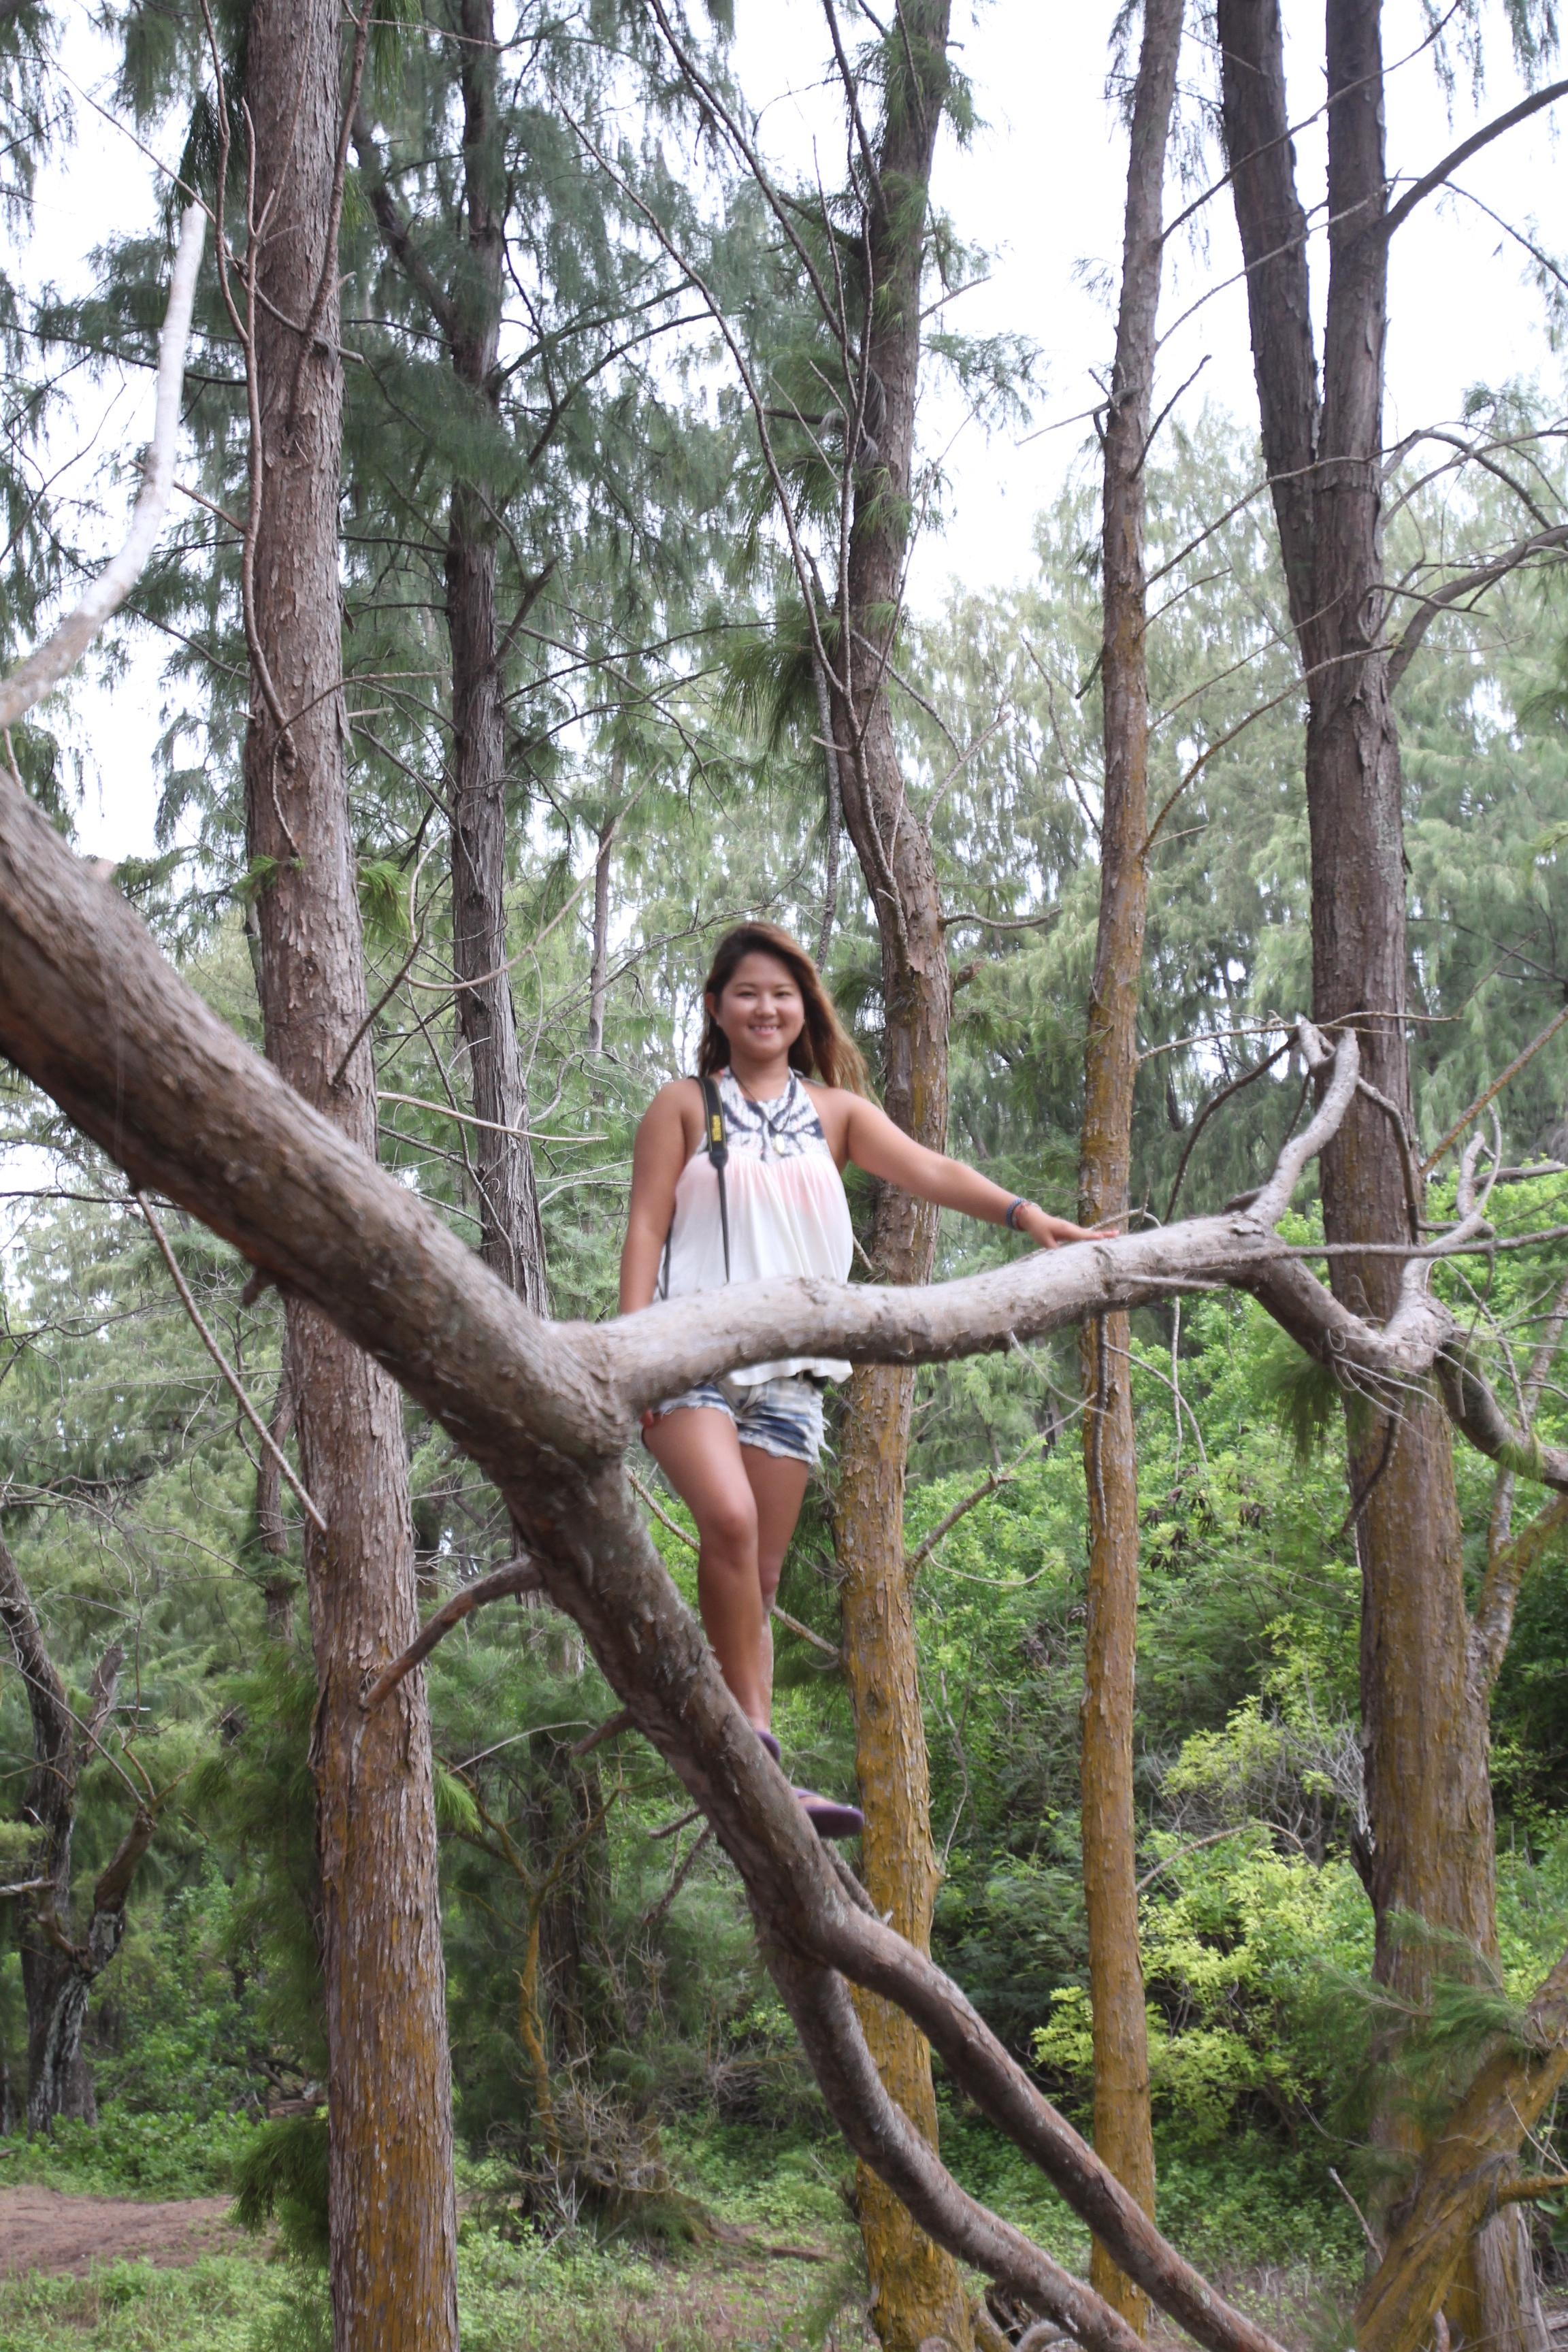 Jungle in Waimanalo, Oahu, Hawaii